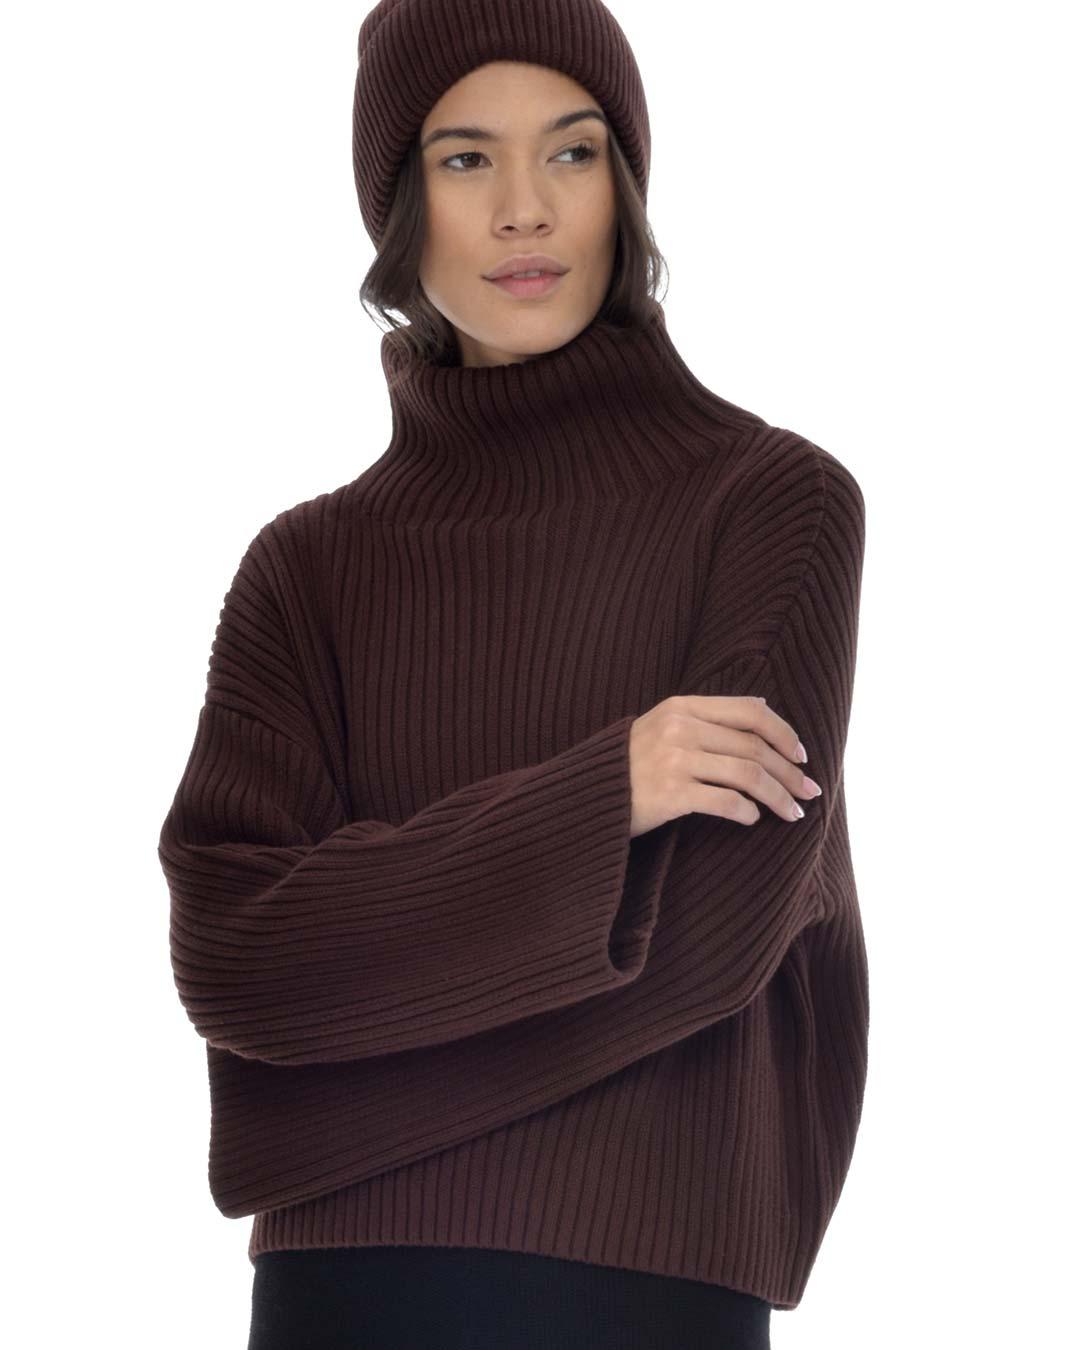 paper-label-hunter-sweater-espresso-front-dianes-lingerie-vancouver-1080x1350